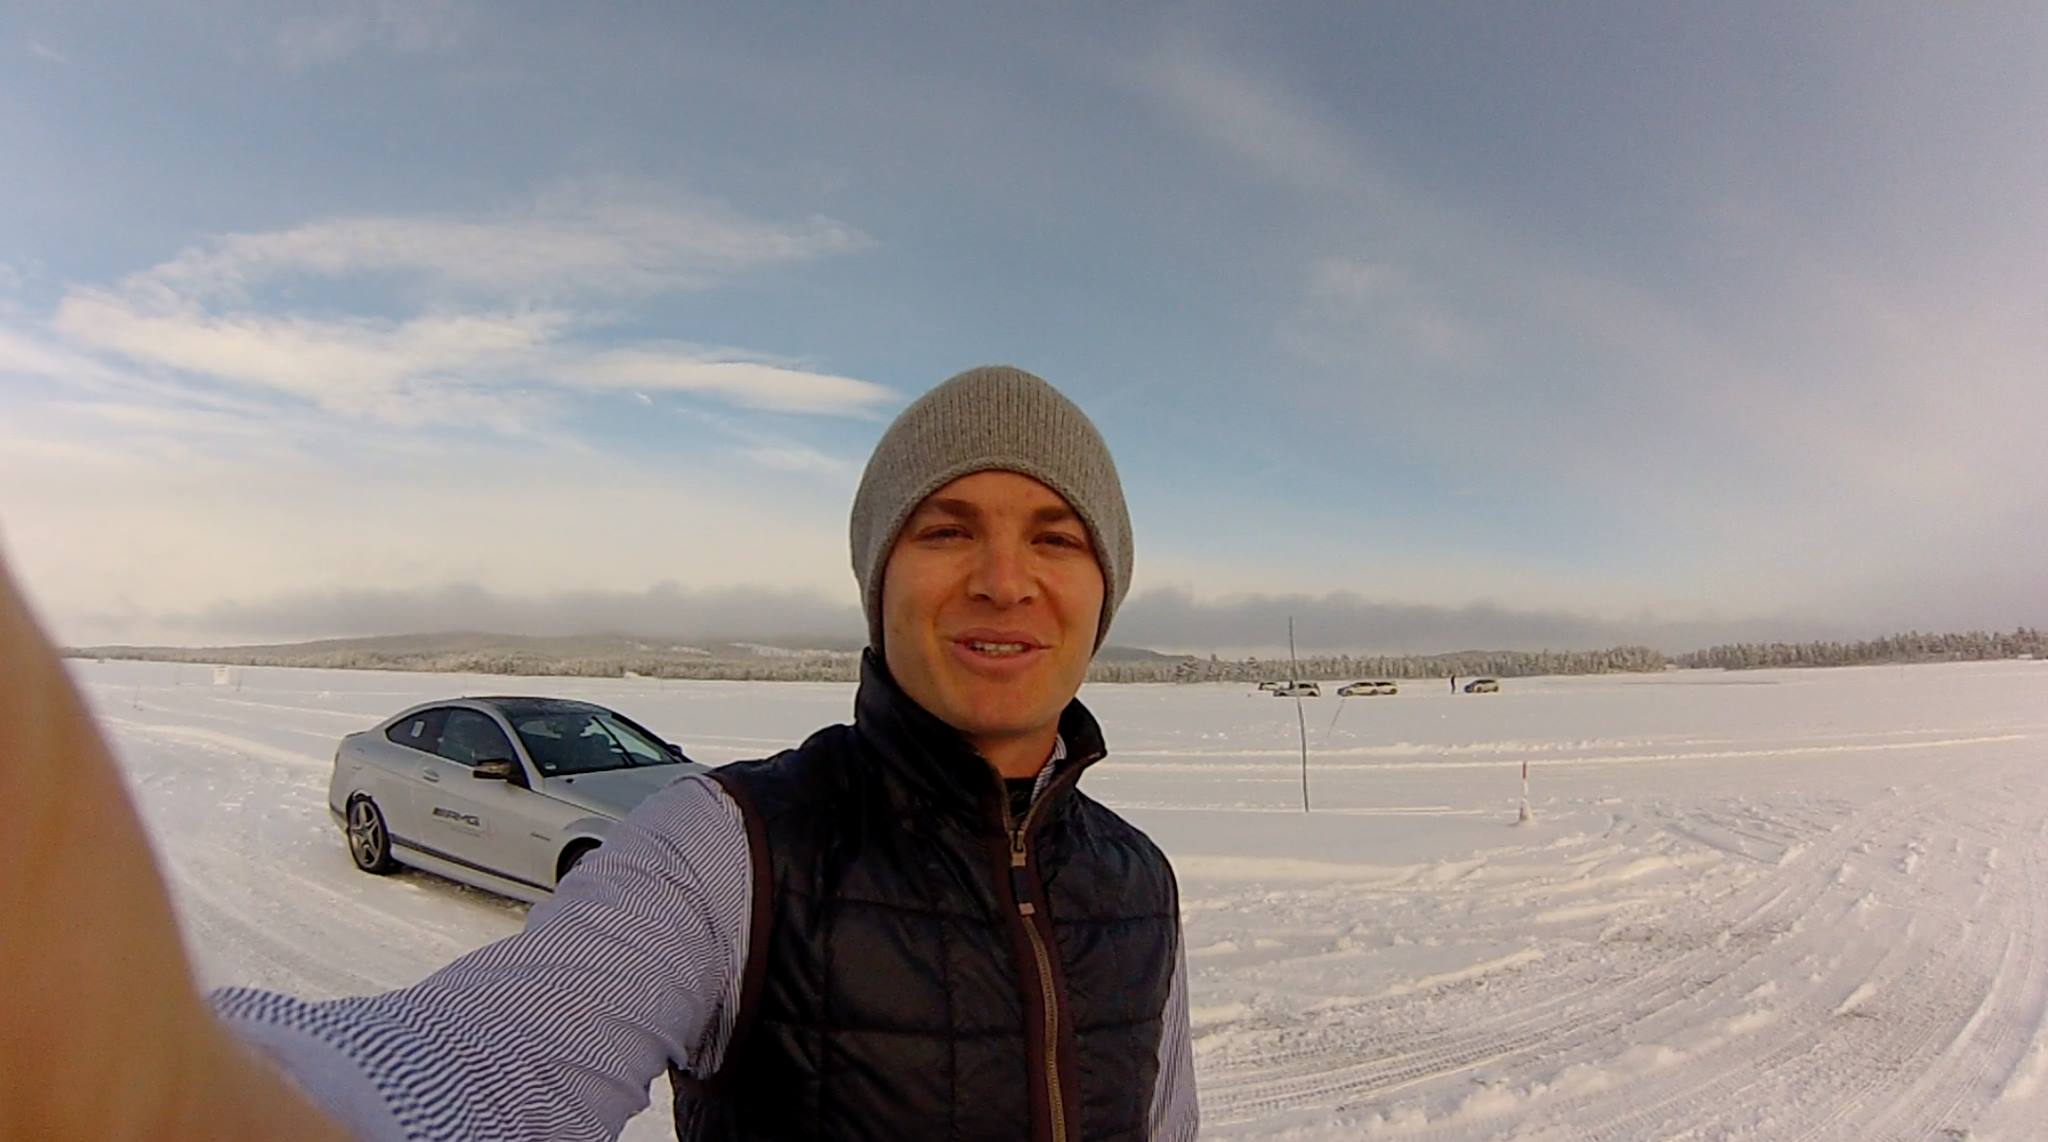 ice driving challenge in sweden #megafun #warmUp in the snow @MercedesAMGF1 @MercedesAMG http://t.co/X7g4gMCPU4